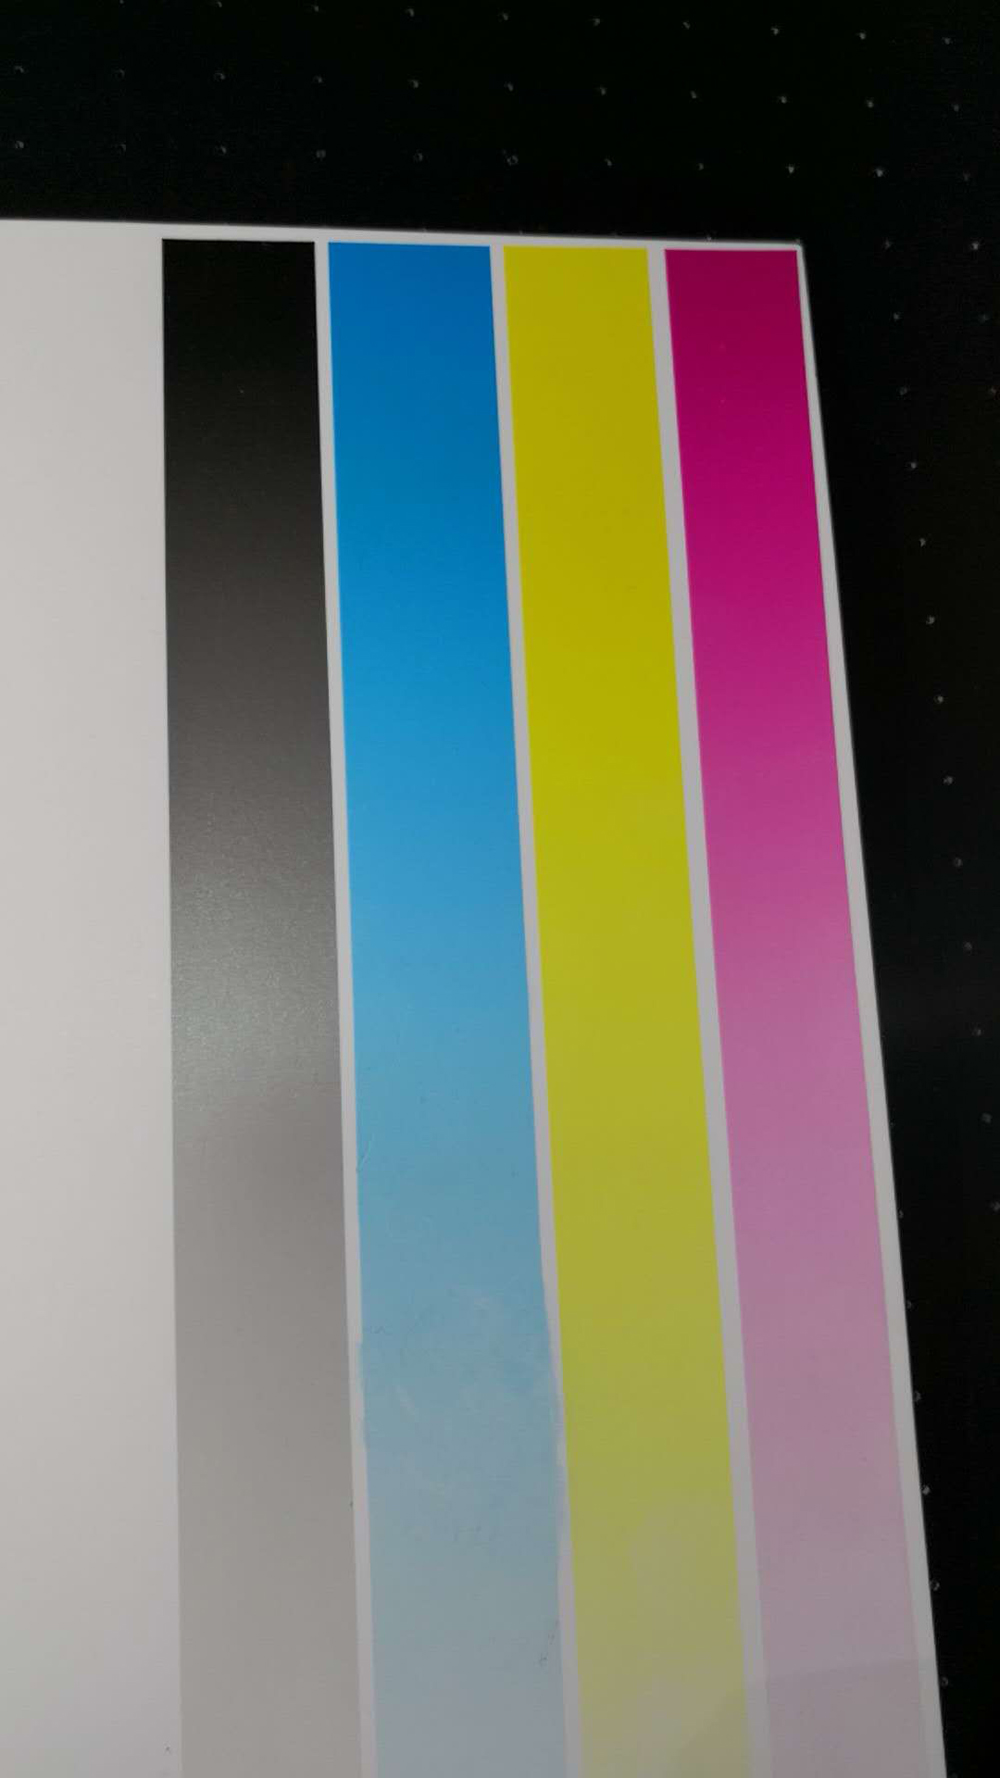 Picture of Demo printer--Mimaki UJF-6042MKII Printer UV Flatbed Printer